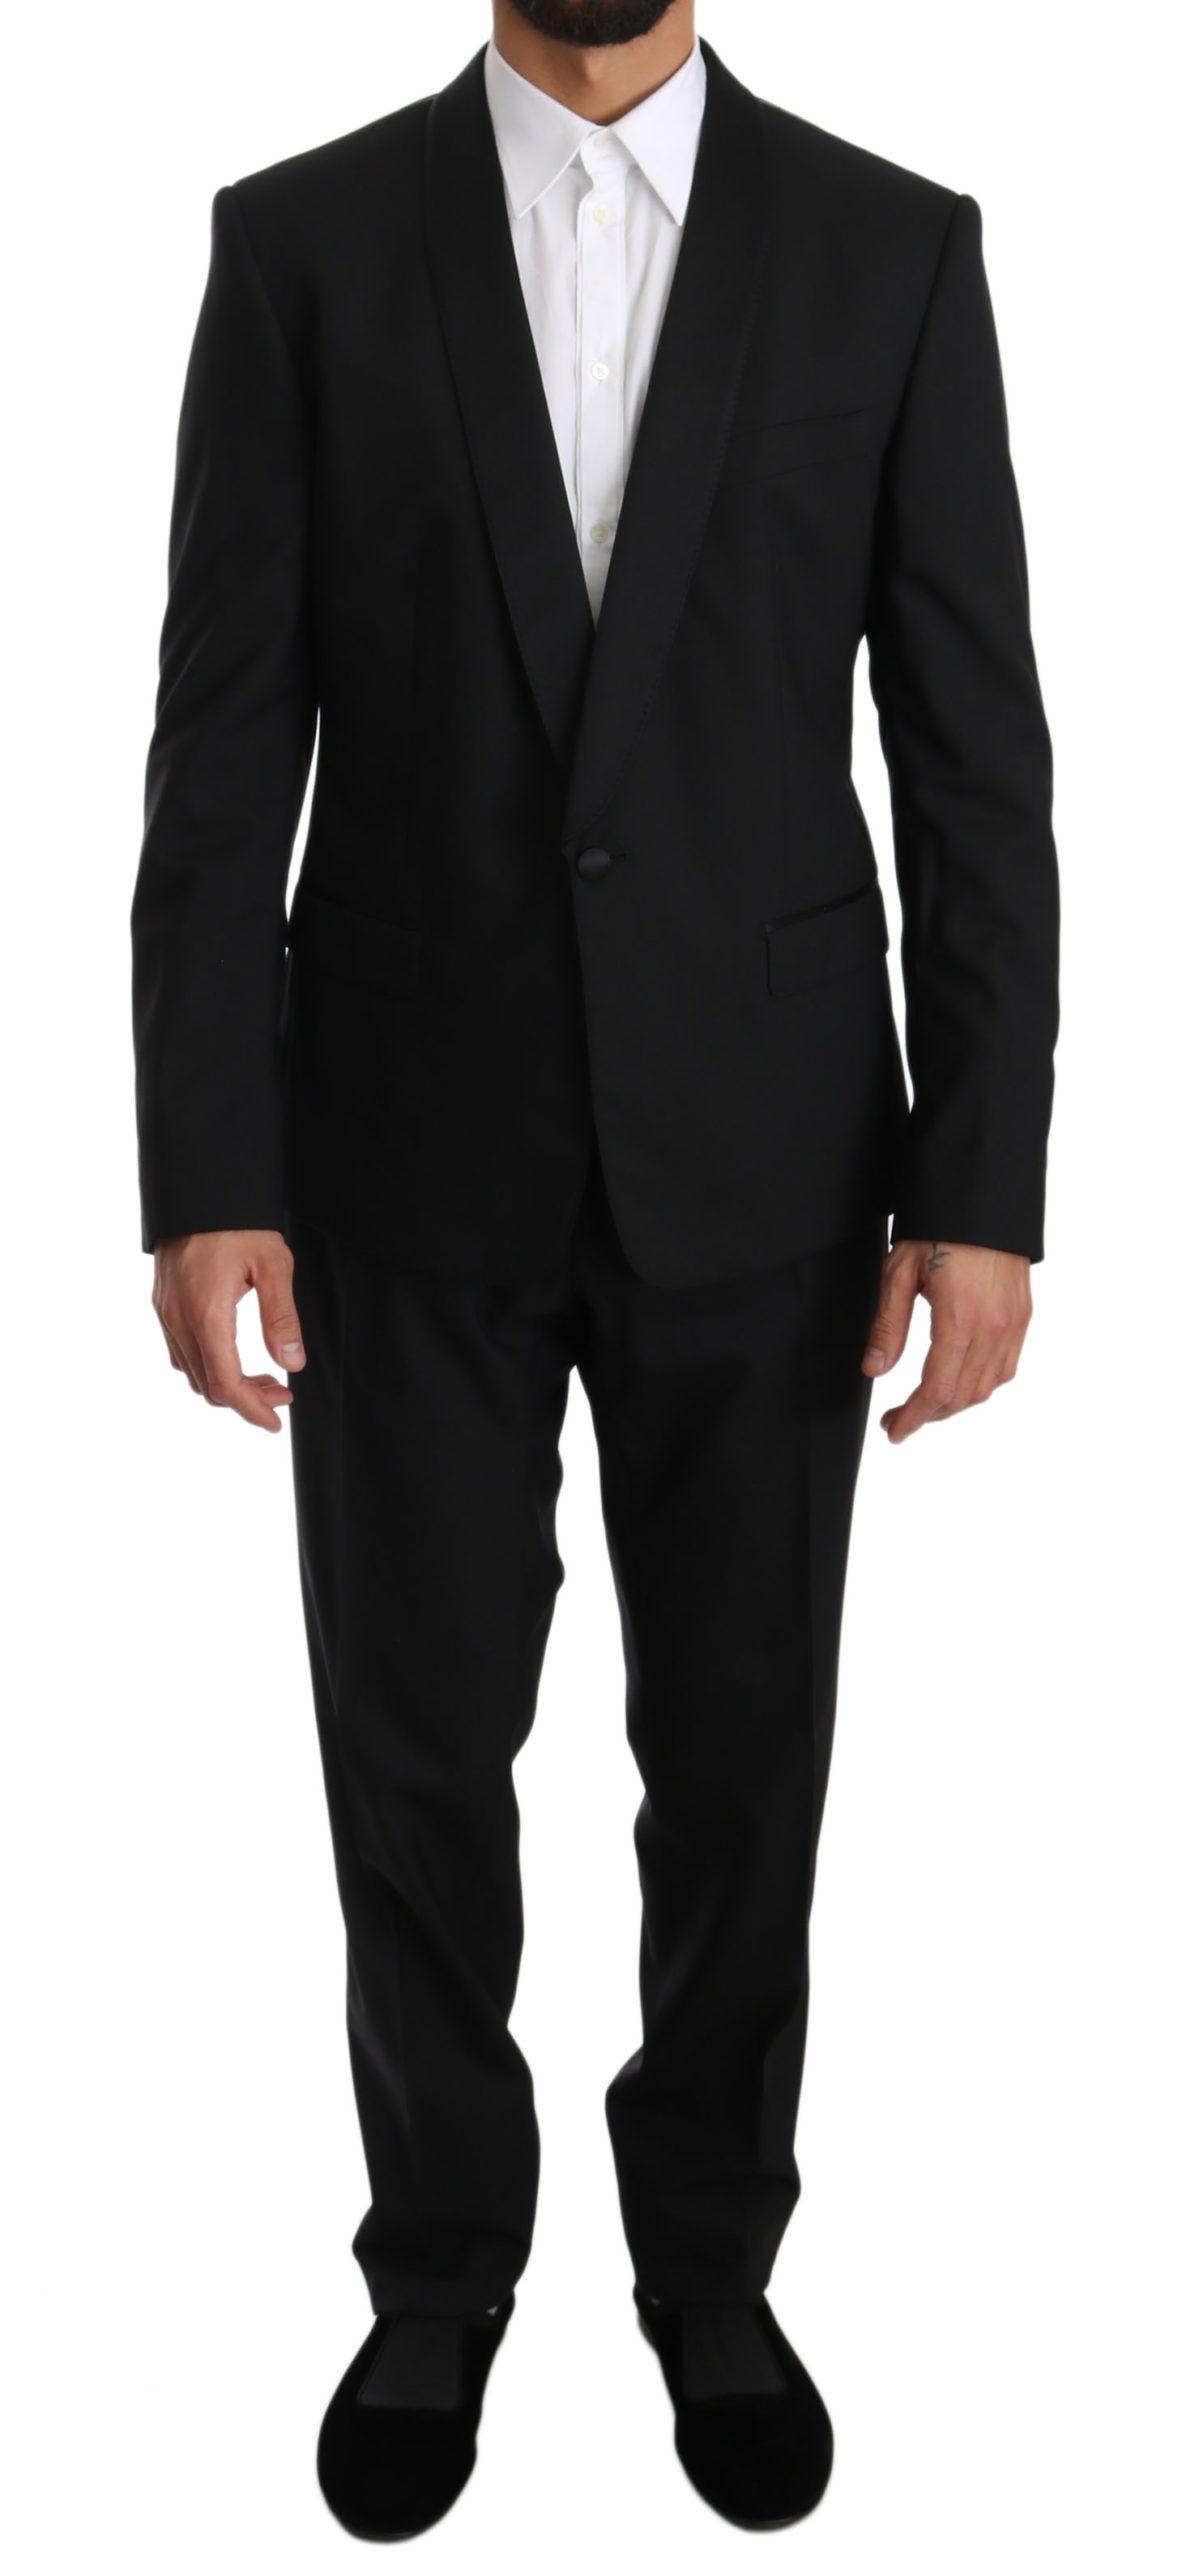 Dolce & Gabbana Men's Wool One Button Slim Martini Suit Black KOS1300 - IT52   L